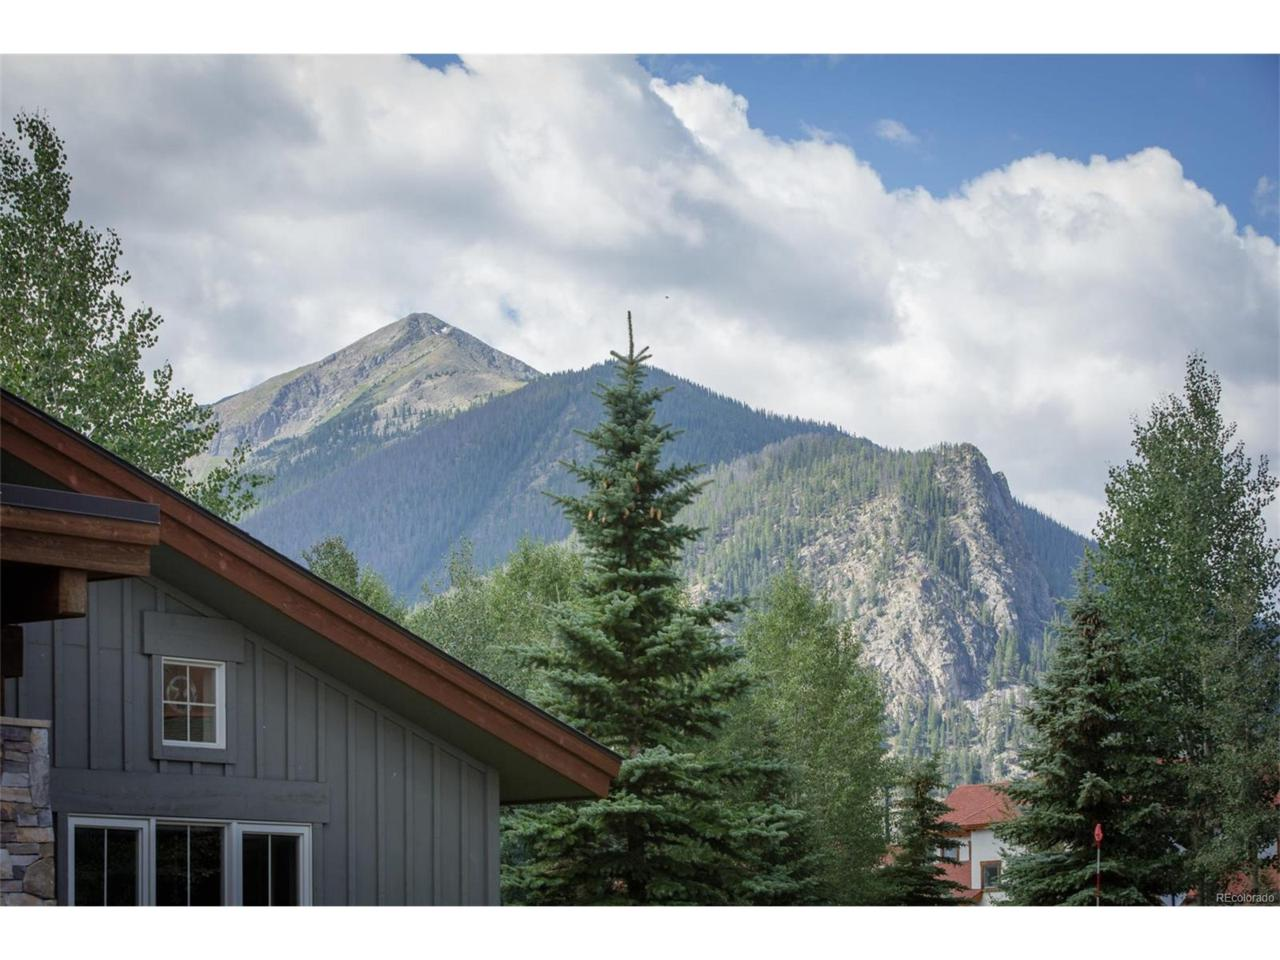 801 Lakepoint Drive B15, Frisco, CO 80443 (MLS #4844766) :: 8z Real Estate